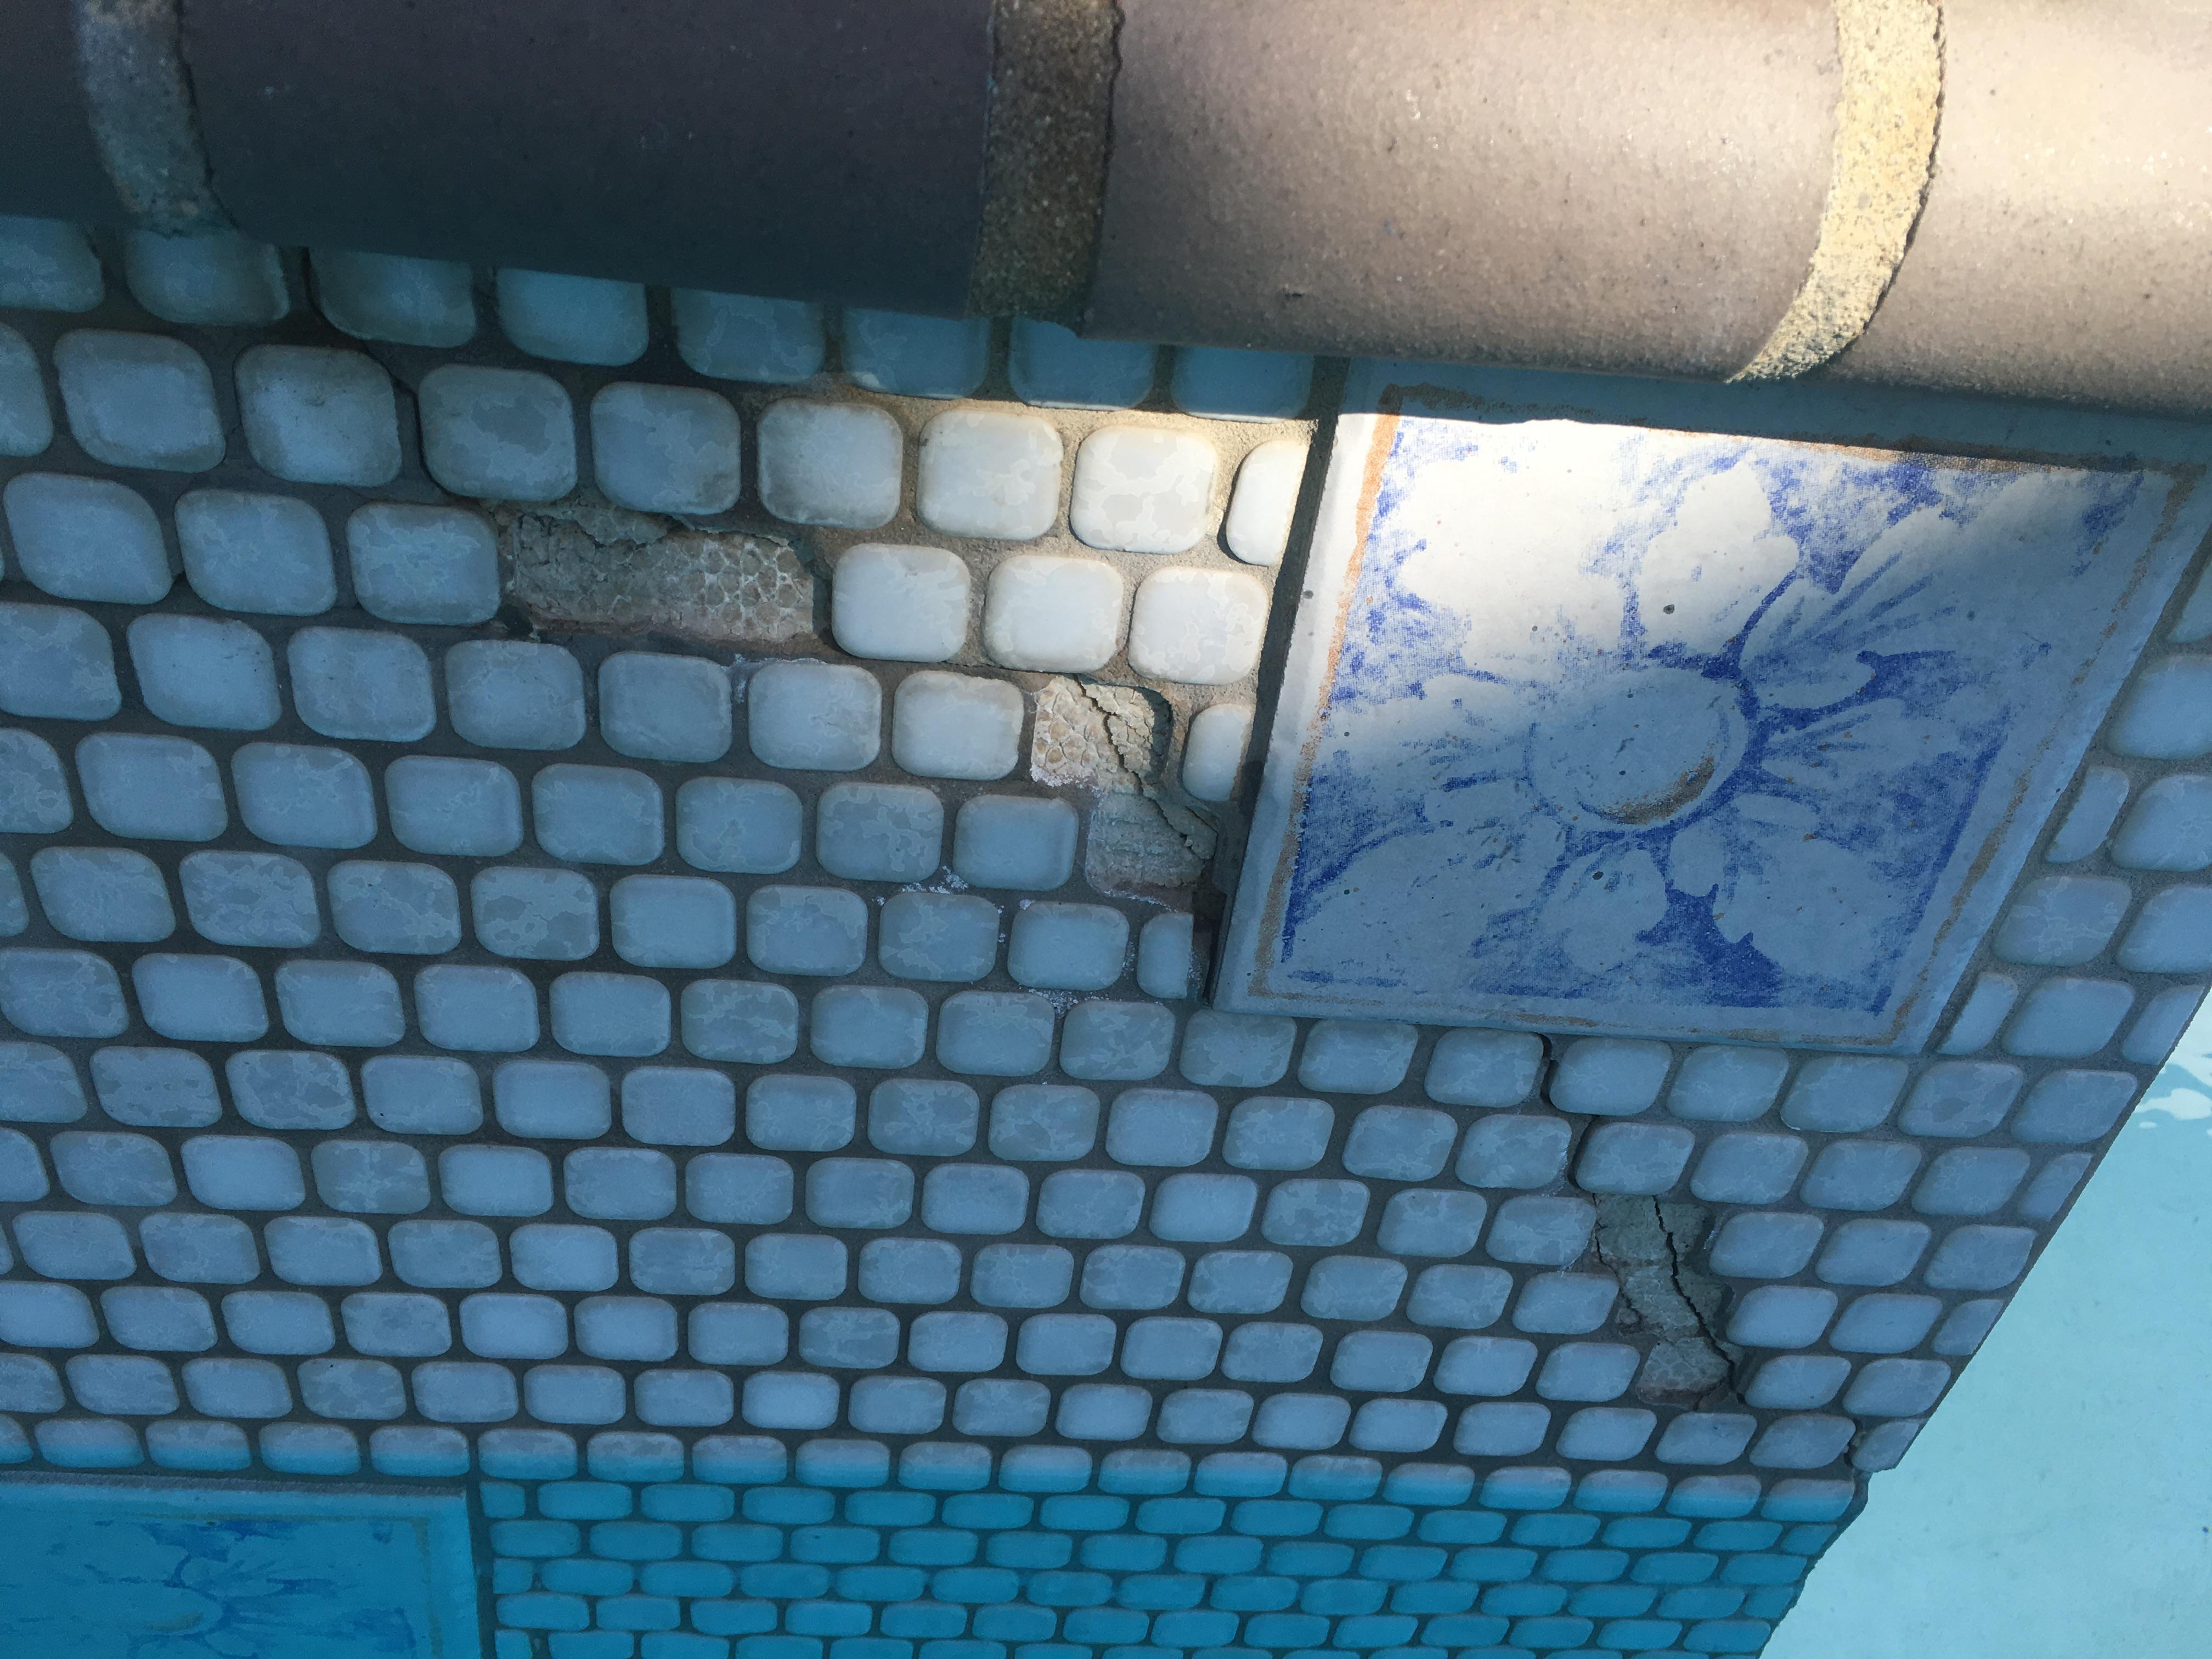 Aqua Solutions Pool & Spa Service and Repair